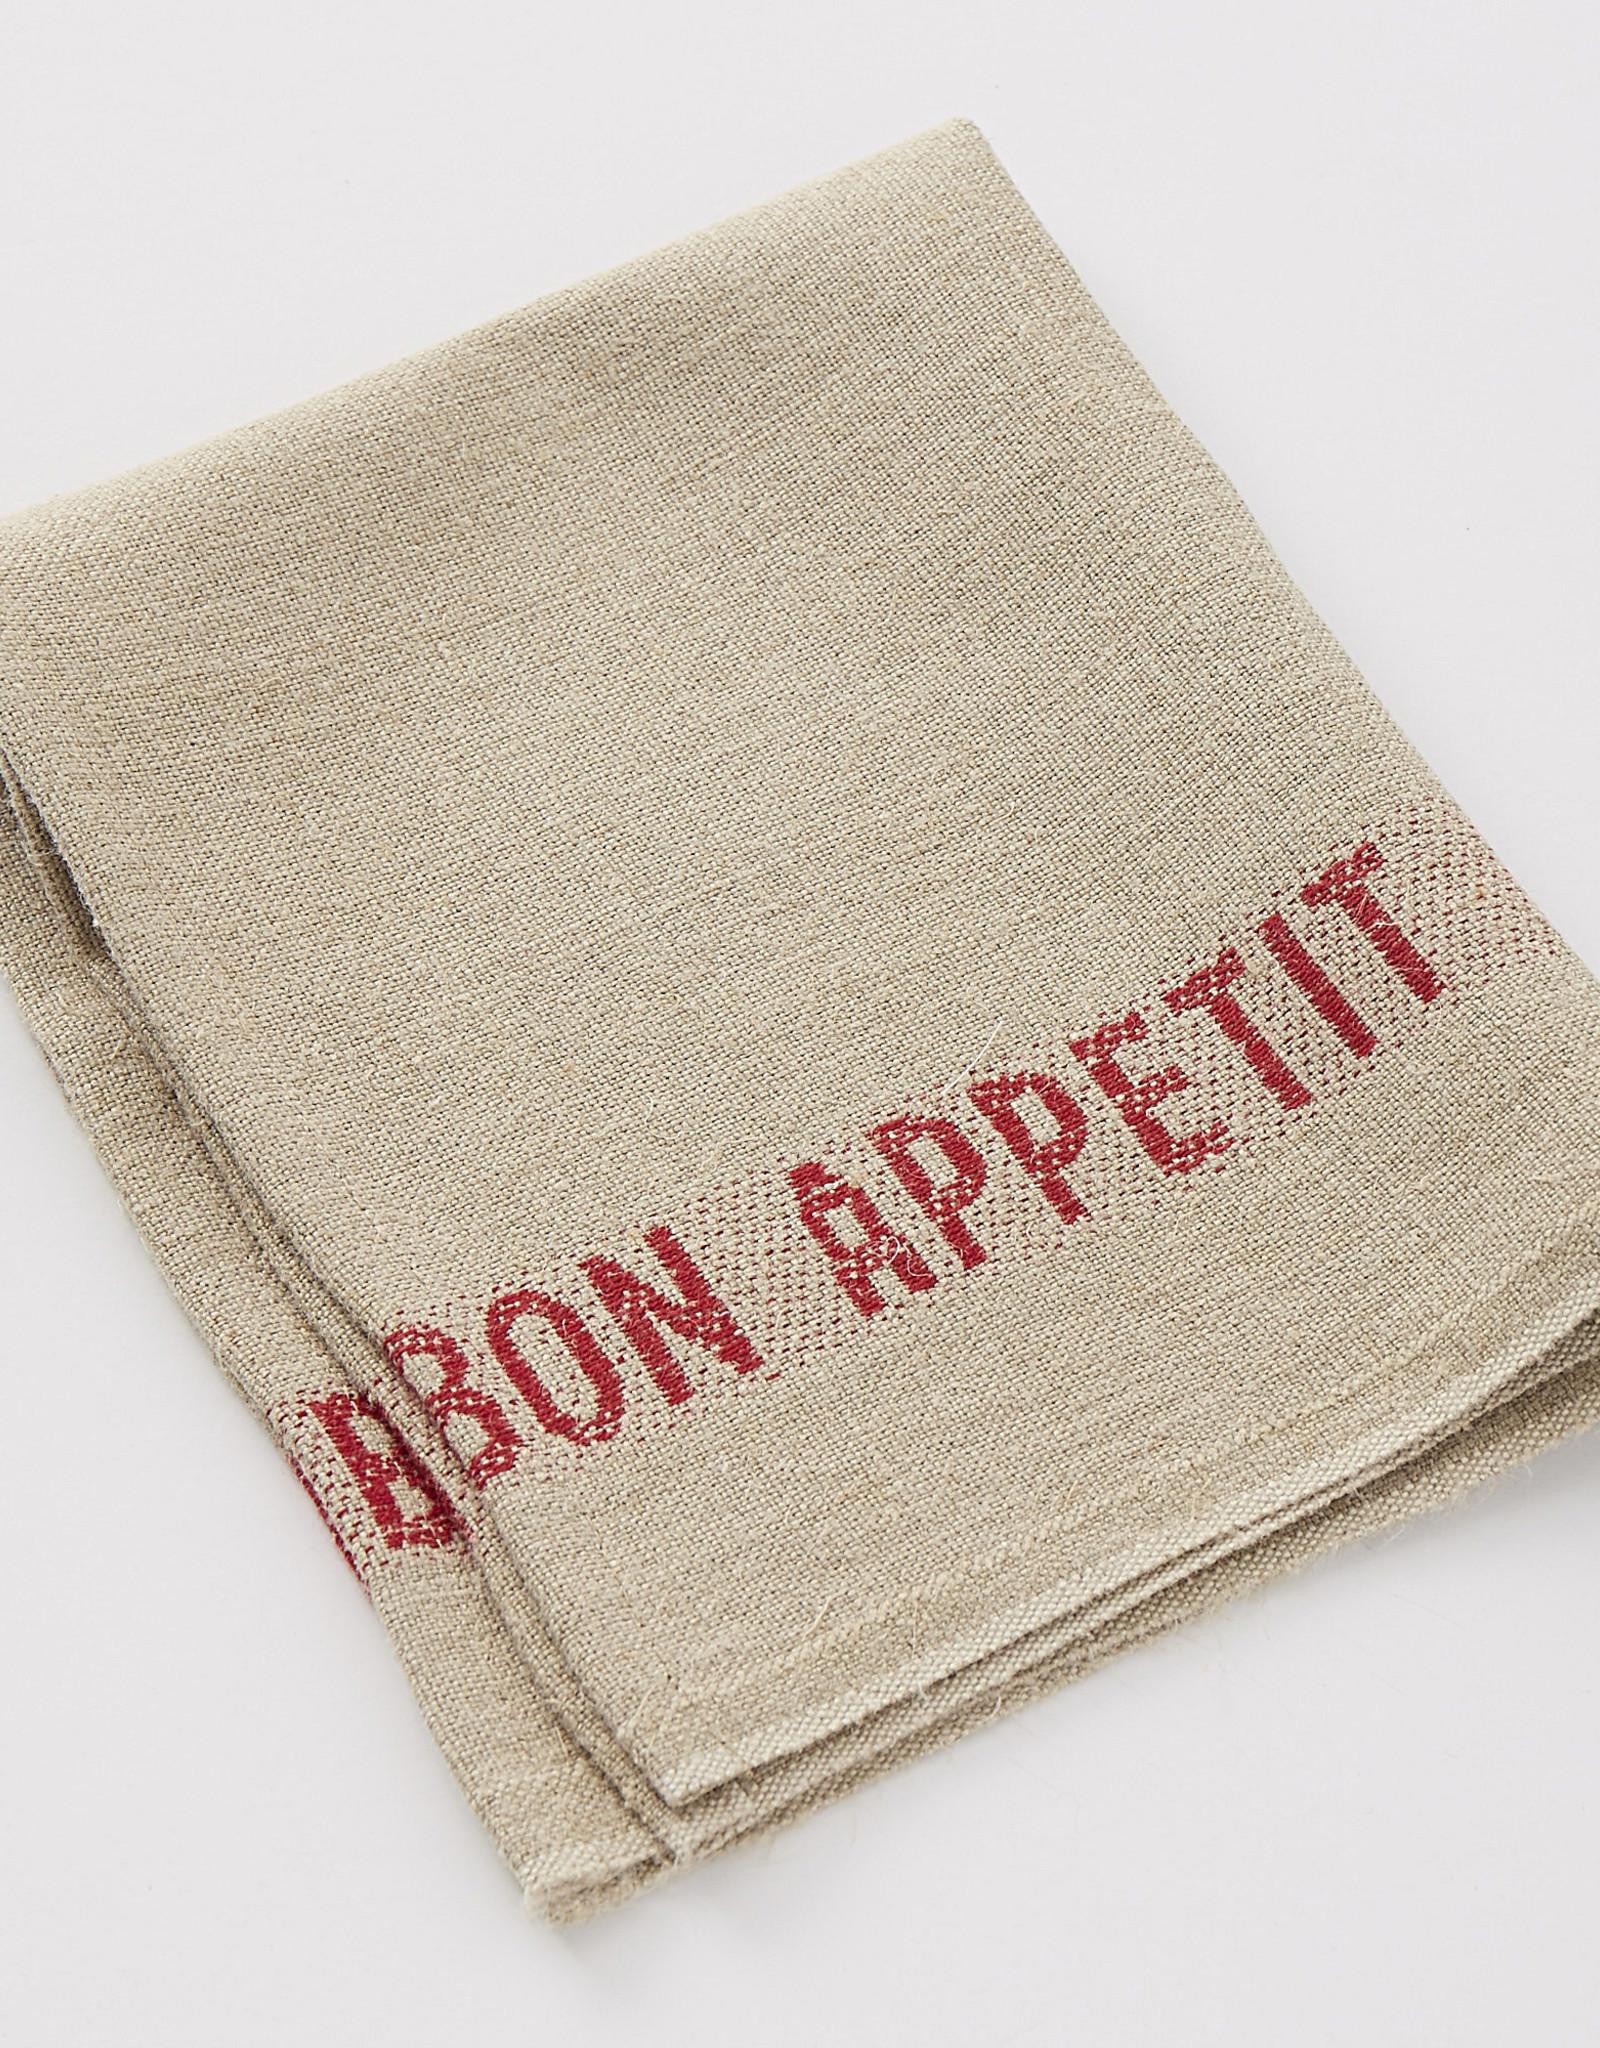 "Charvet Editions - Napkin/Placemat Bon Appetit Natural/Red 17""x13"""